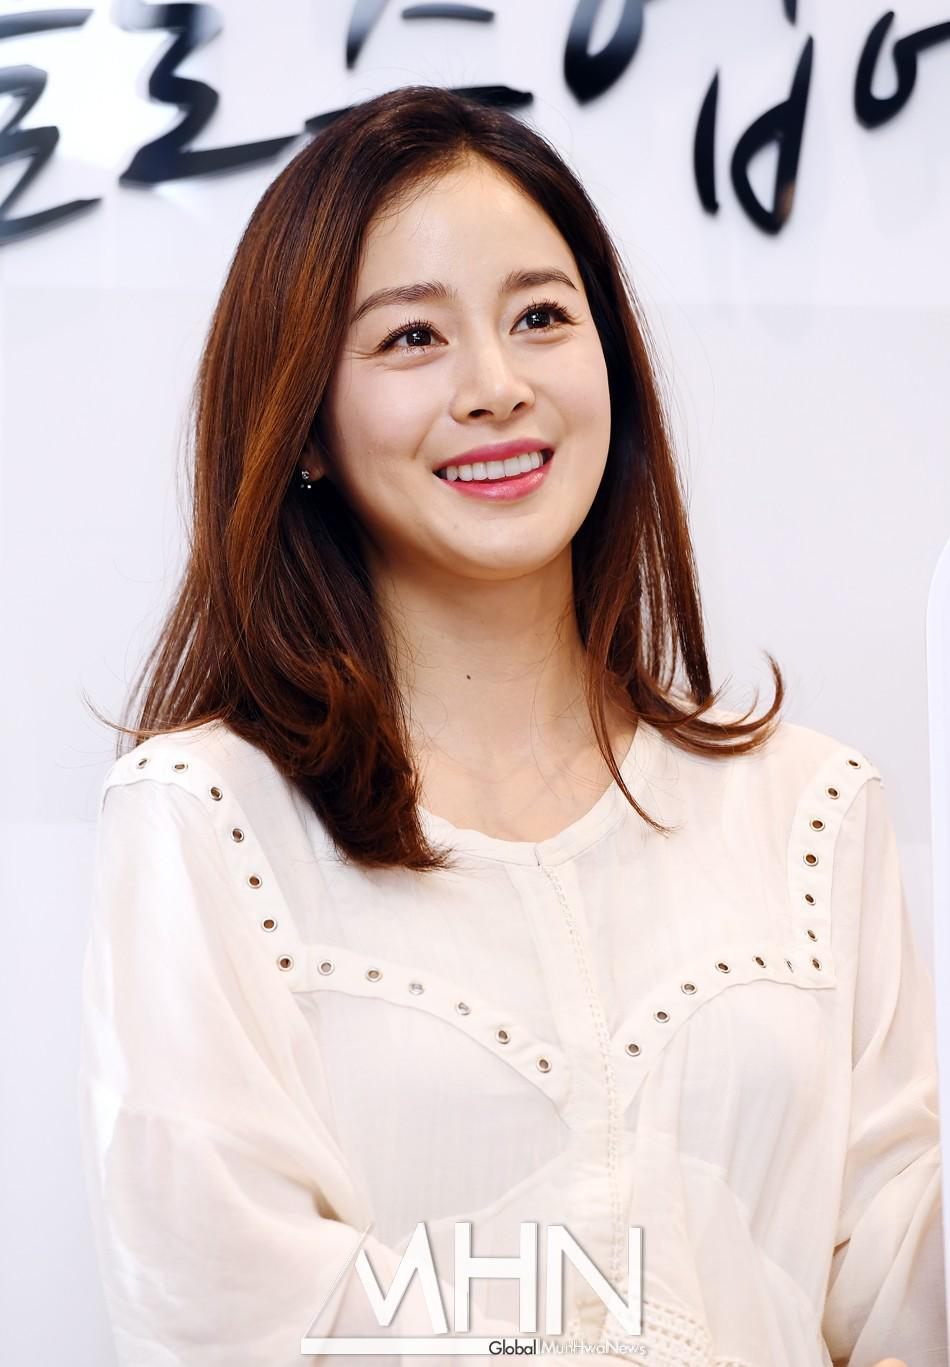 o an 3 nam de lay chong sinh con, kim tae hee ngoi nha van vuot mat song hye kyo - 1